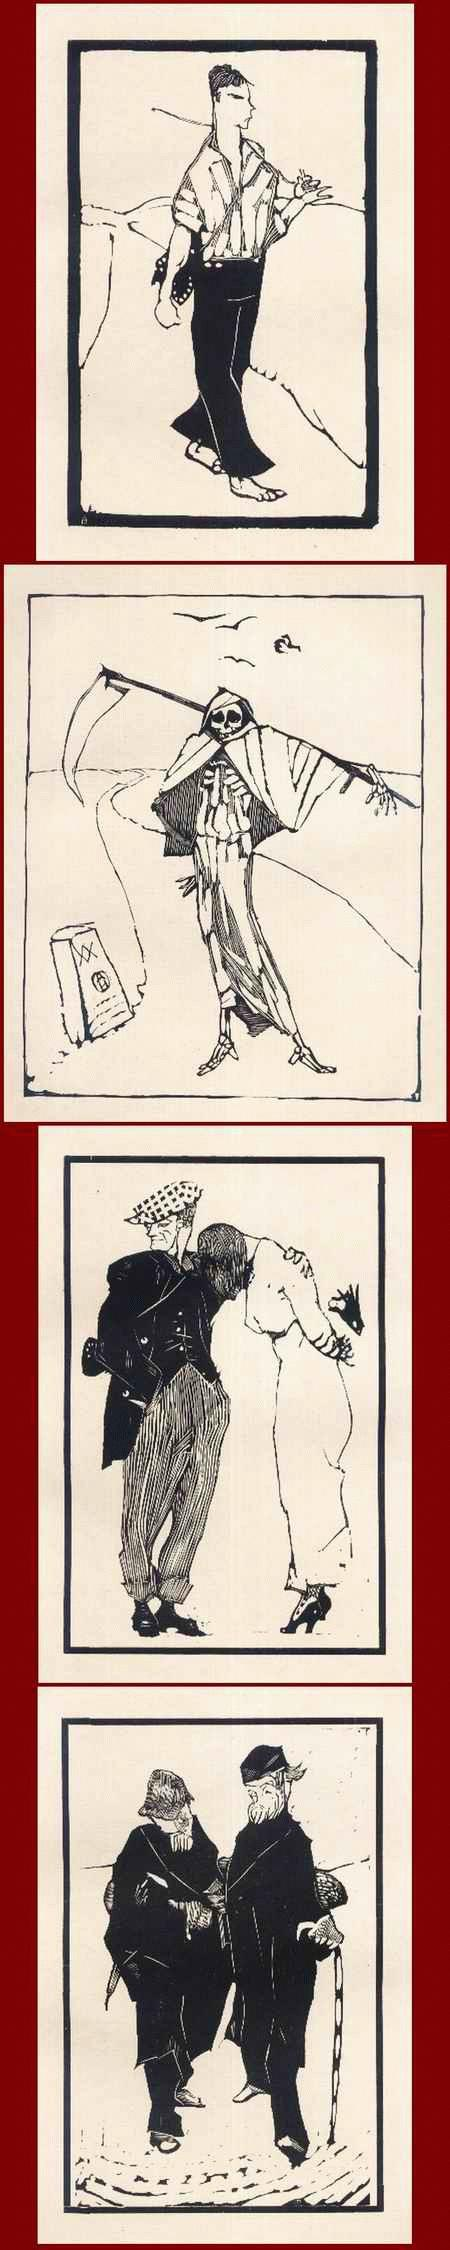 Arminius Hasemann - TIPPELBRUDER - ABSCHIED - TOD - PHILOSOPHEN 4 OriginalHolzschnitte d.abenteuerlichen Wanderers 1915 kopen? Bied vanaf 65!